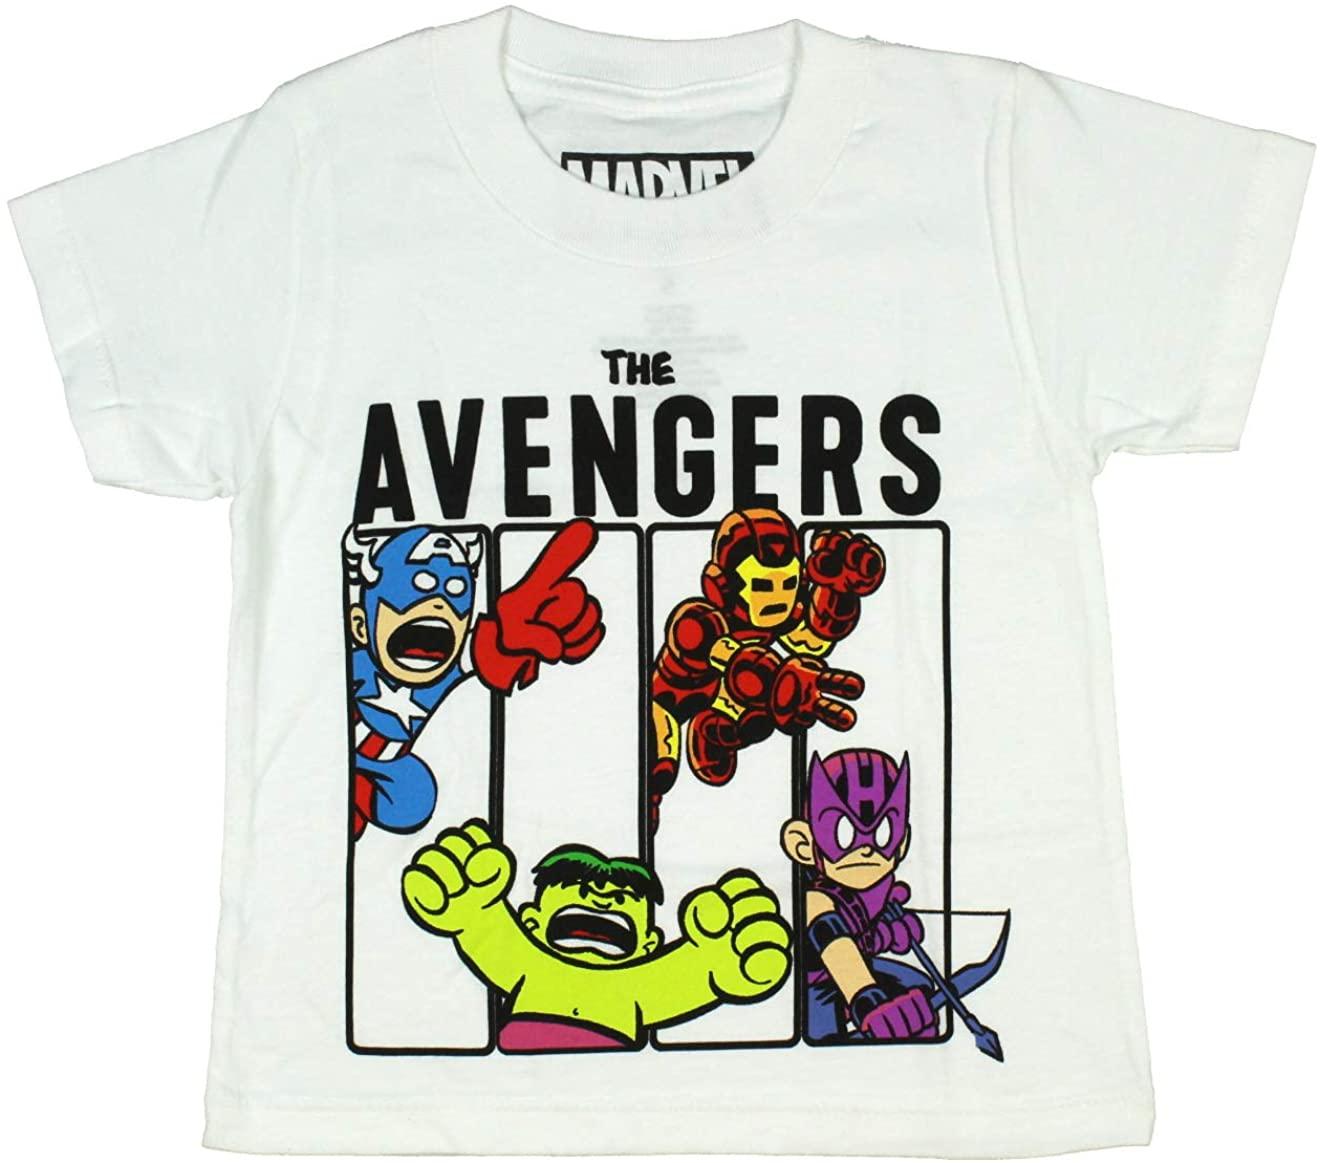 Captain America Iron Man Hulk Hawkeye Toddler Boy's Baby Heroes T-Shirt